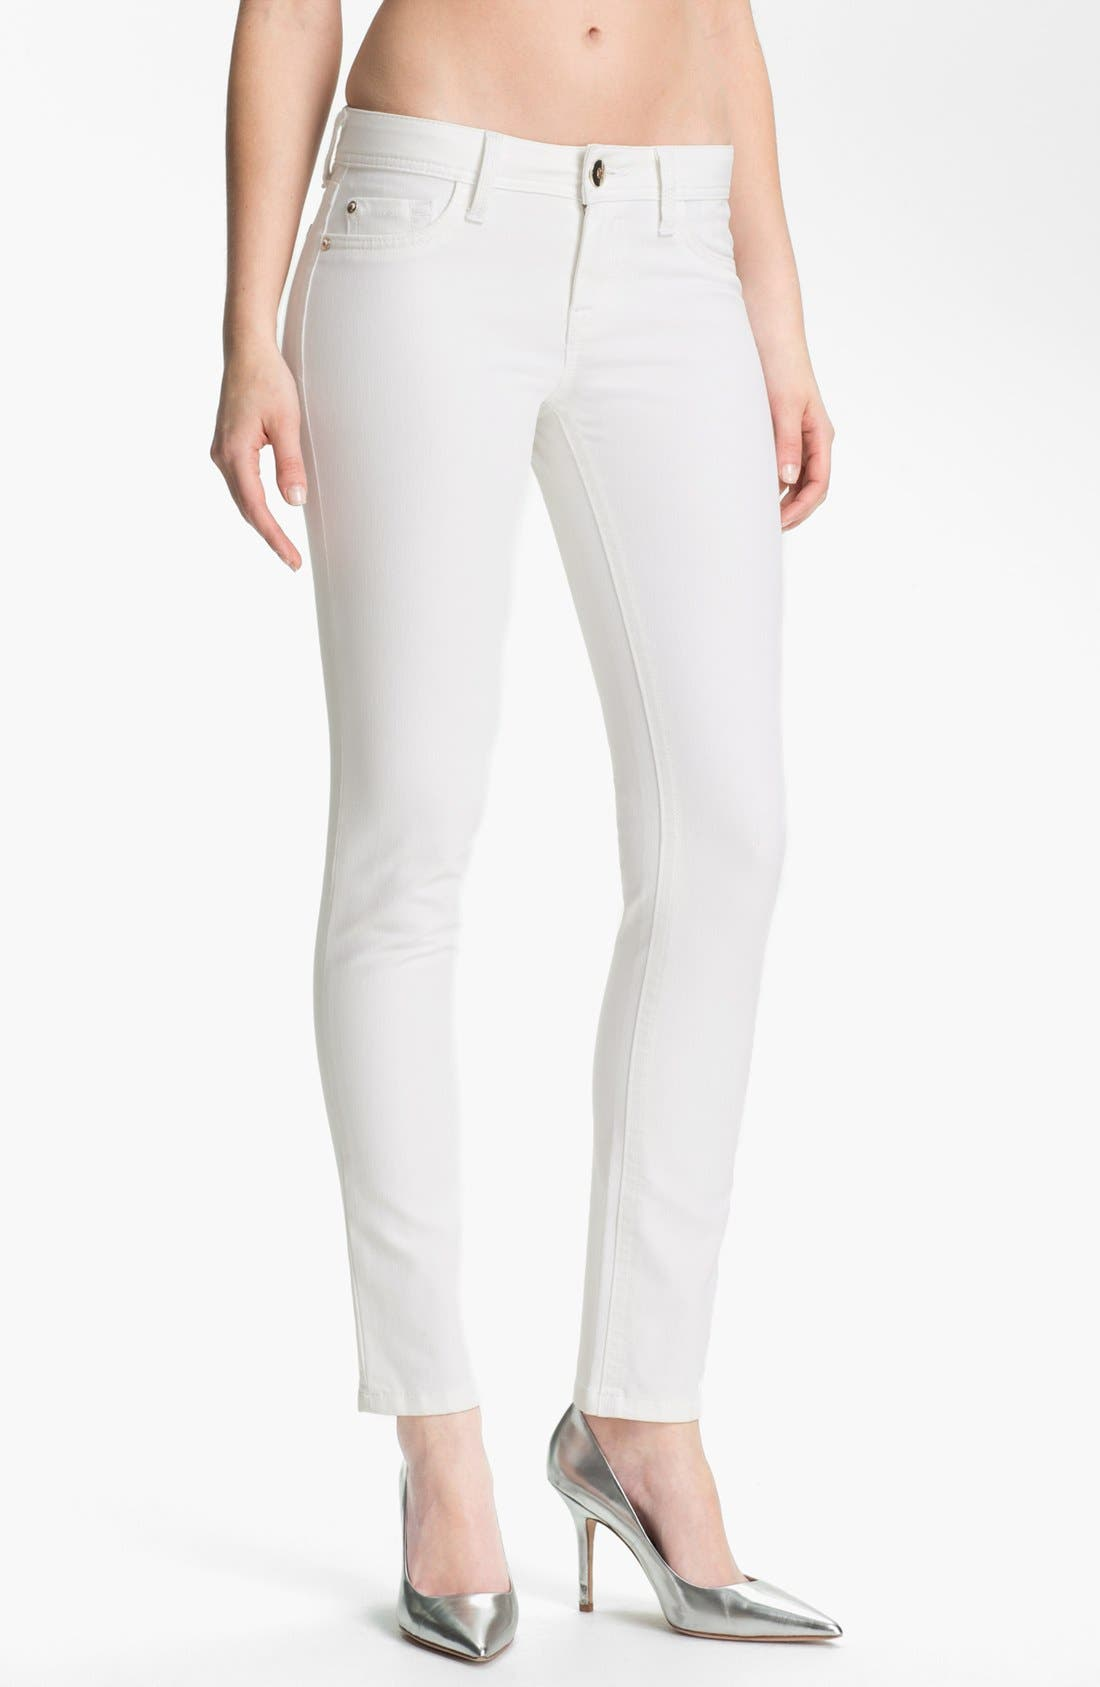 Alternate Image 1 Selected - DL1961 'Amanda' X-Fit Stretch Denim Skinny Jeans (Milk)